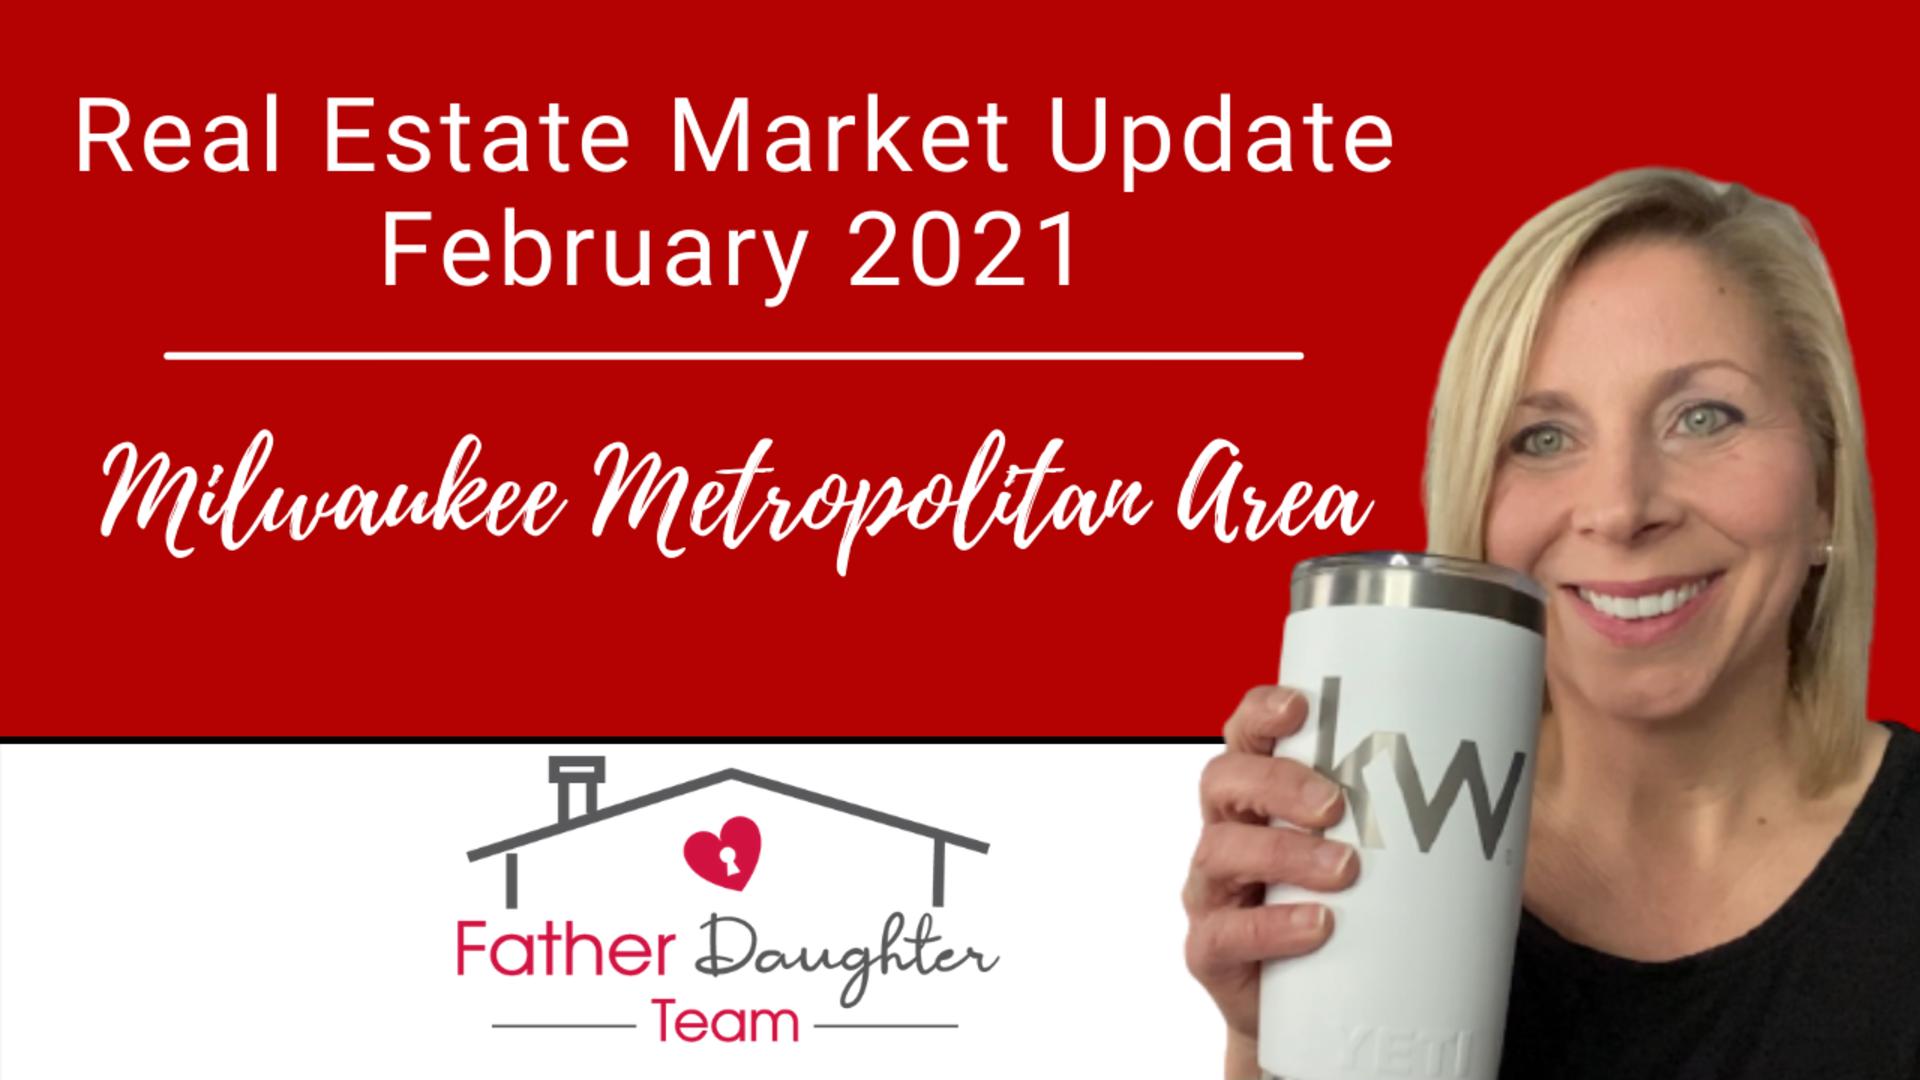 Real Estate Market Update February 2021 | Milwaukee Metropolitan Area